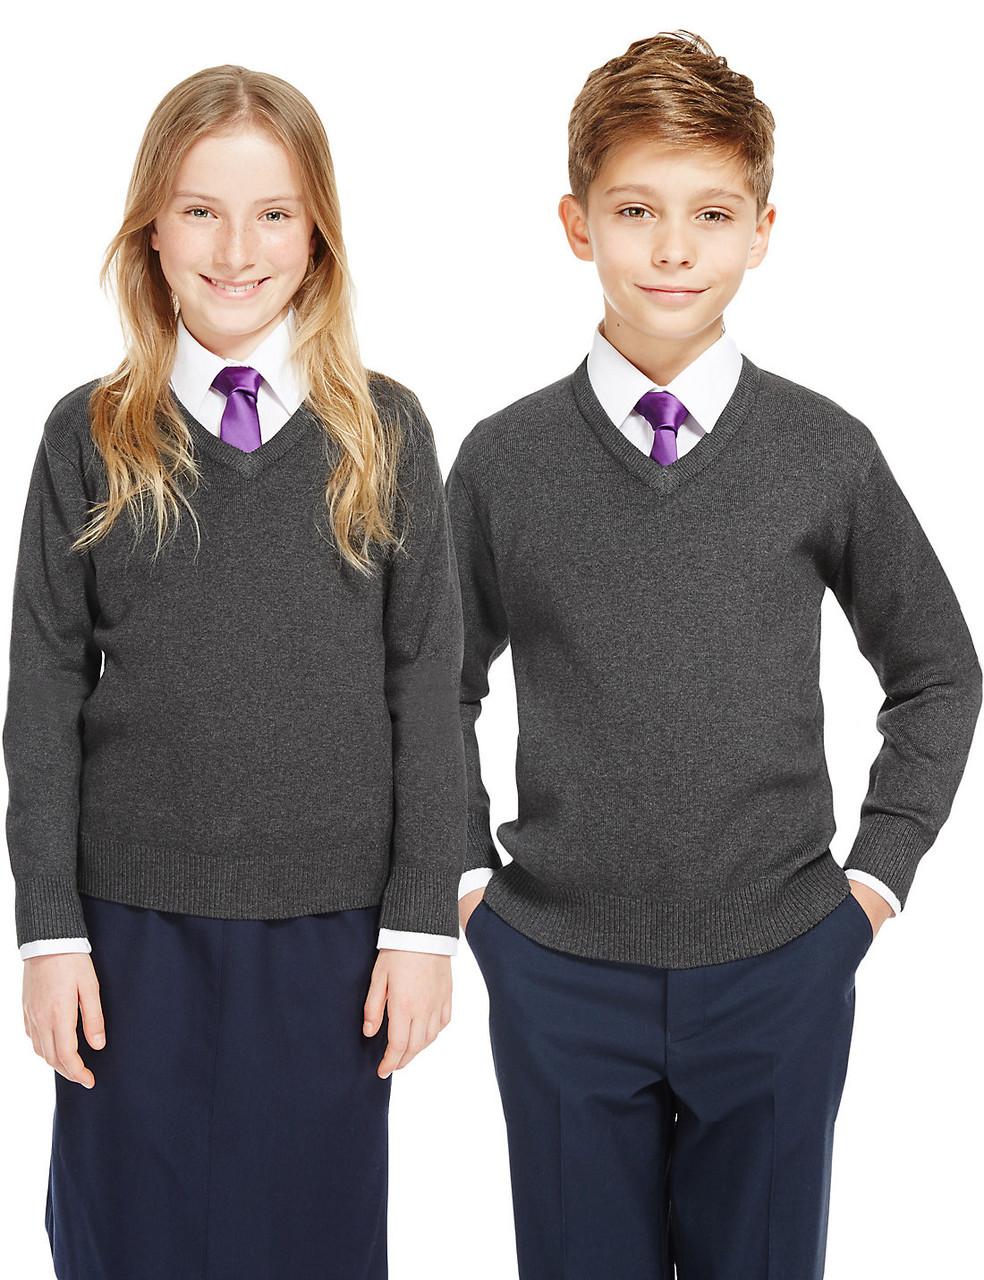 Школьный джемпер серый на мальчика 10-11-12-13-14 лет George (Aнглия)